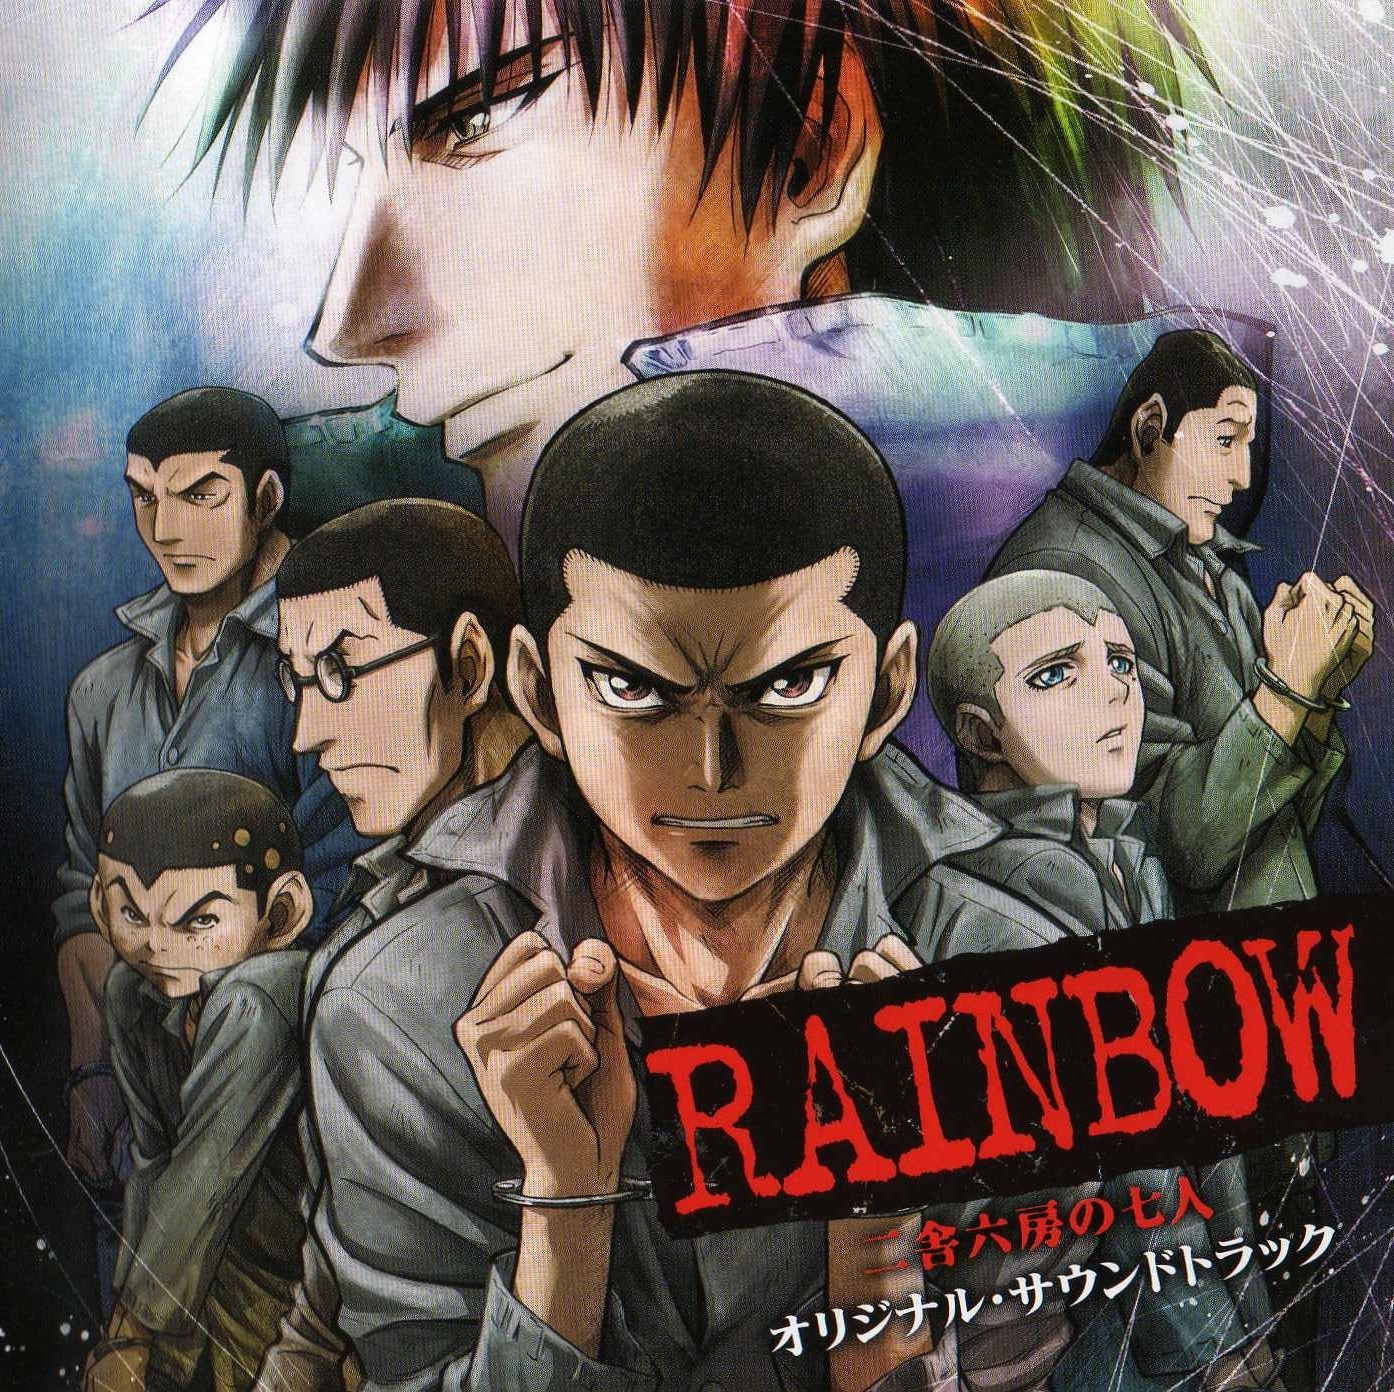 Rainbow. .Nisha .Rokubou.No .Shichinin.full .1108949 - Rainbow: Nisha Rokubō no Shichinin | 26/26 | HD 720p | MEGA